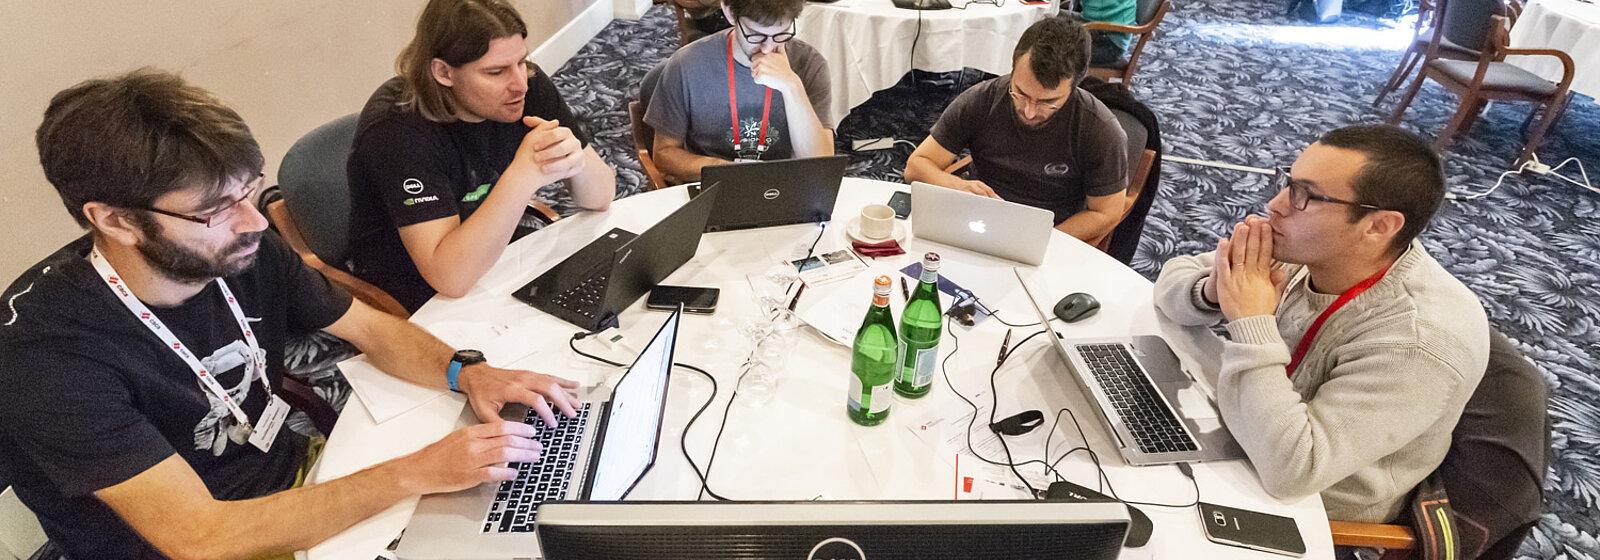 EuroHack19 - GPU Programming Hackathon | CSCS